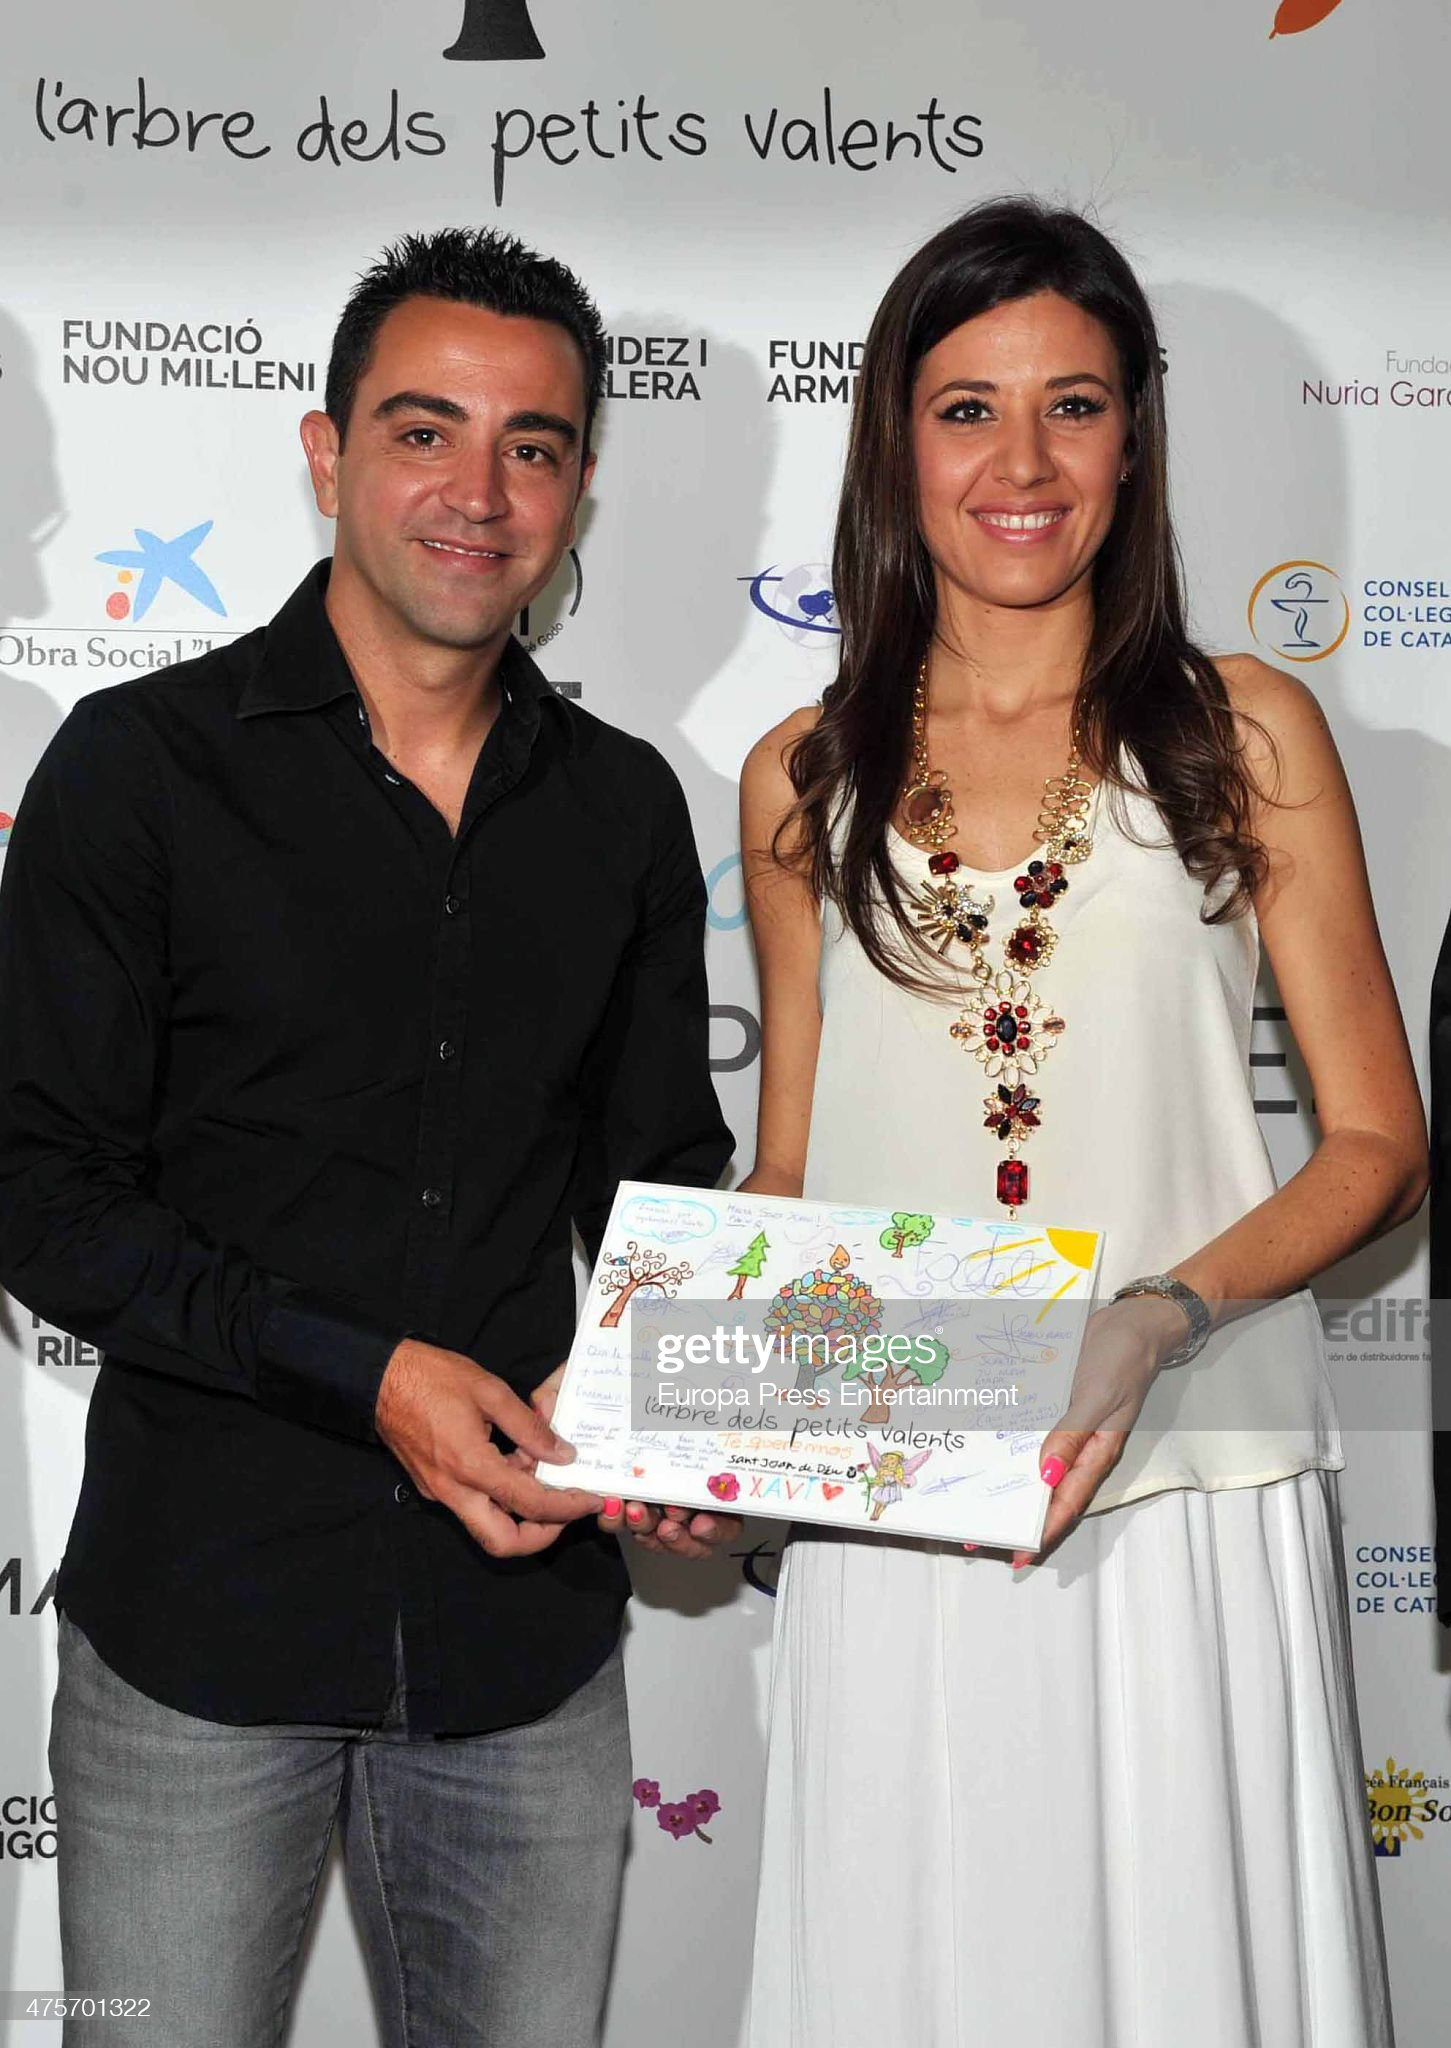 Charla general sobre estatura, etc - Página 16 Barcelona-football-player-xavi-hernandez-and-his-wife-nuria-cunillera-picture-id475701322?s=2048x2048